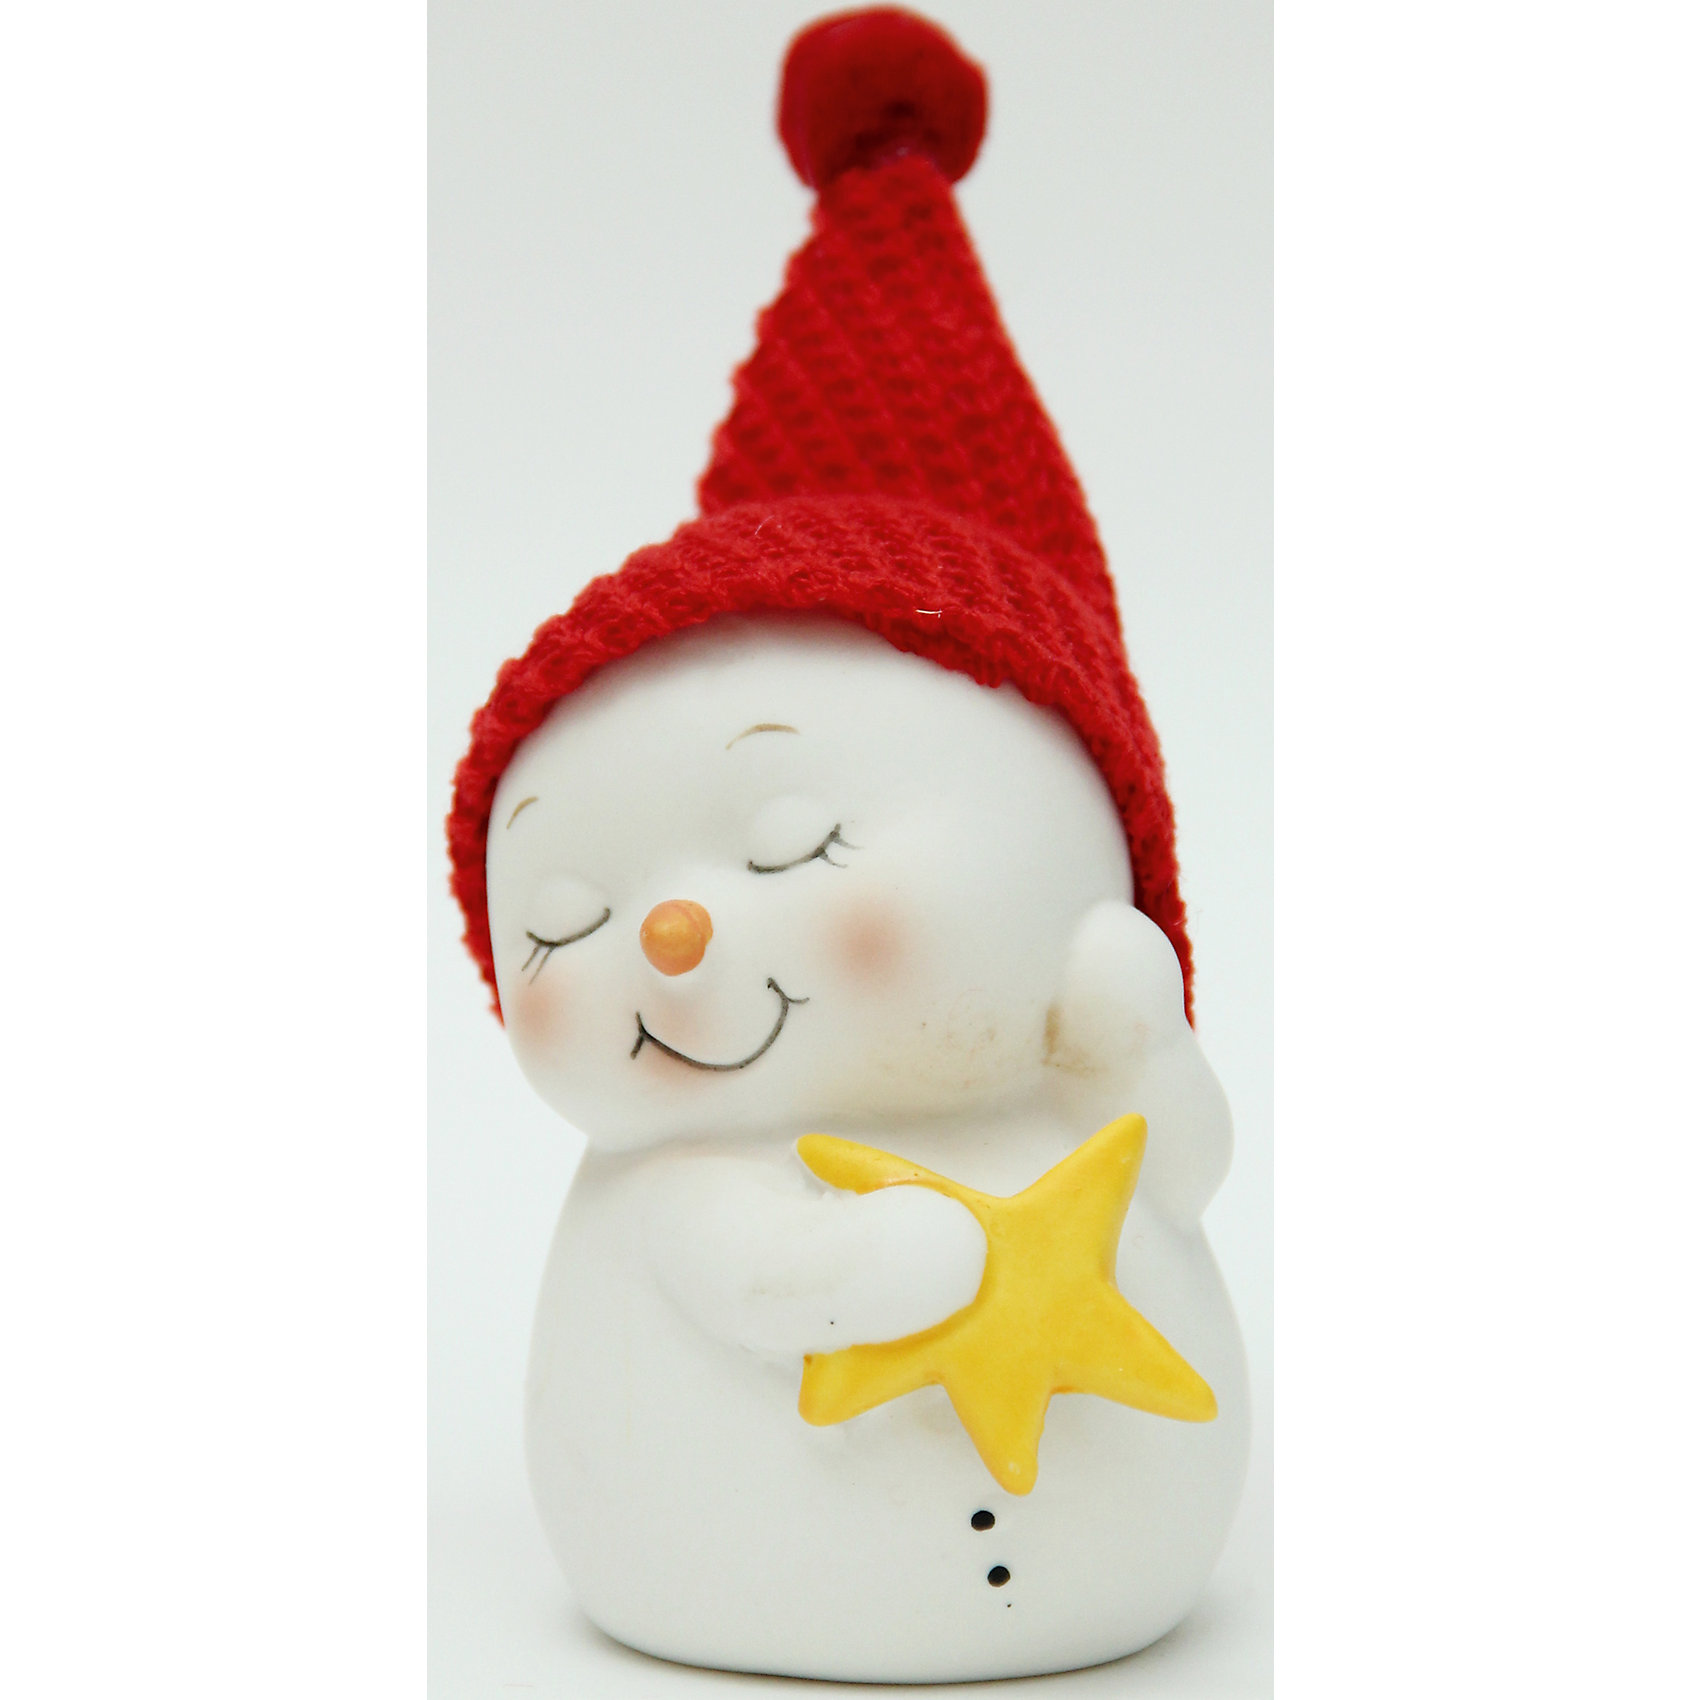 Новогодняя фигурка снеговика Снеговик со звездой  (8см, керамика)Всё для праздника<br>Новогодняя фигурка снеговика Снеговик со звездой арт.38337 (8см, керамика)<br><br>Ширина мм: 60<br>Глубина мм: 60<br>Высота мм: 80<br>Вес г: 131<br>Возраст от месяцев: 60<br>Возраст до месяцев: 600<br>Пол: Унисекс<br>Возраст: Детский<br>SKU: 5144555